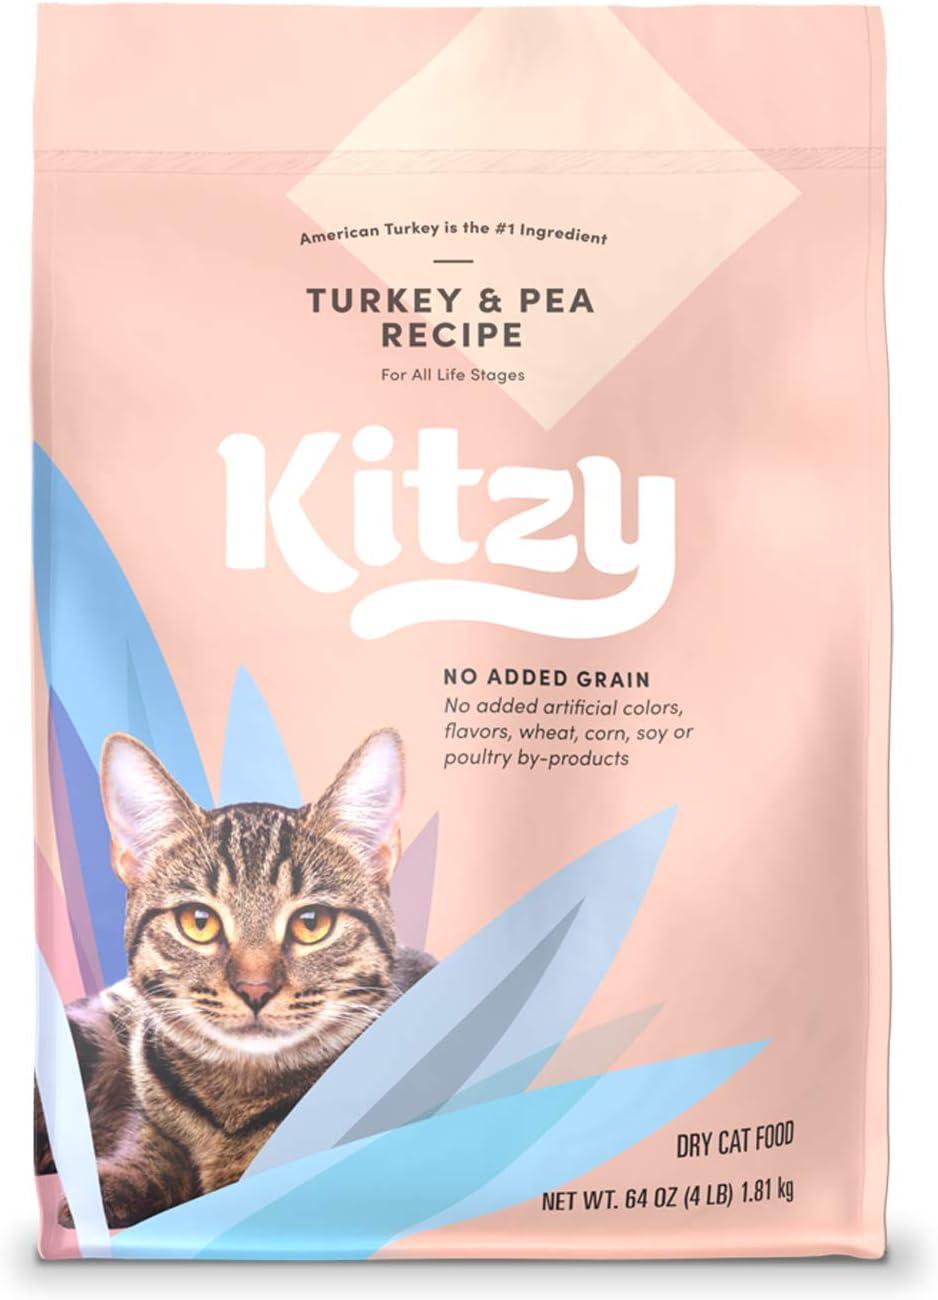 Amazon Brand Sacramento Boston Mall Mall – Kitzy Dry Cat Food No Grains Turkey Added